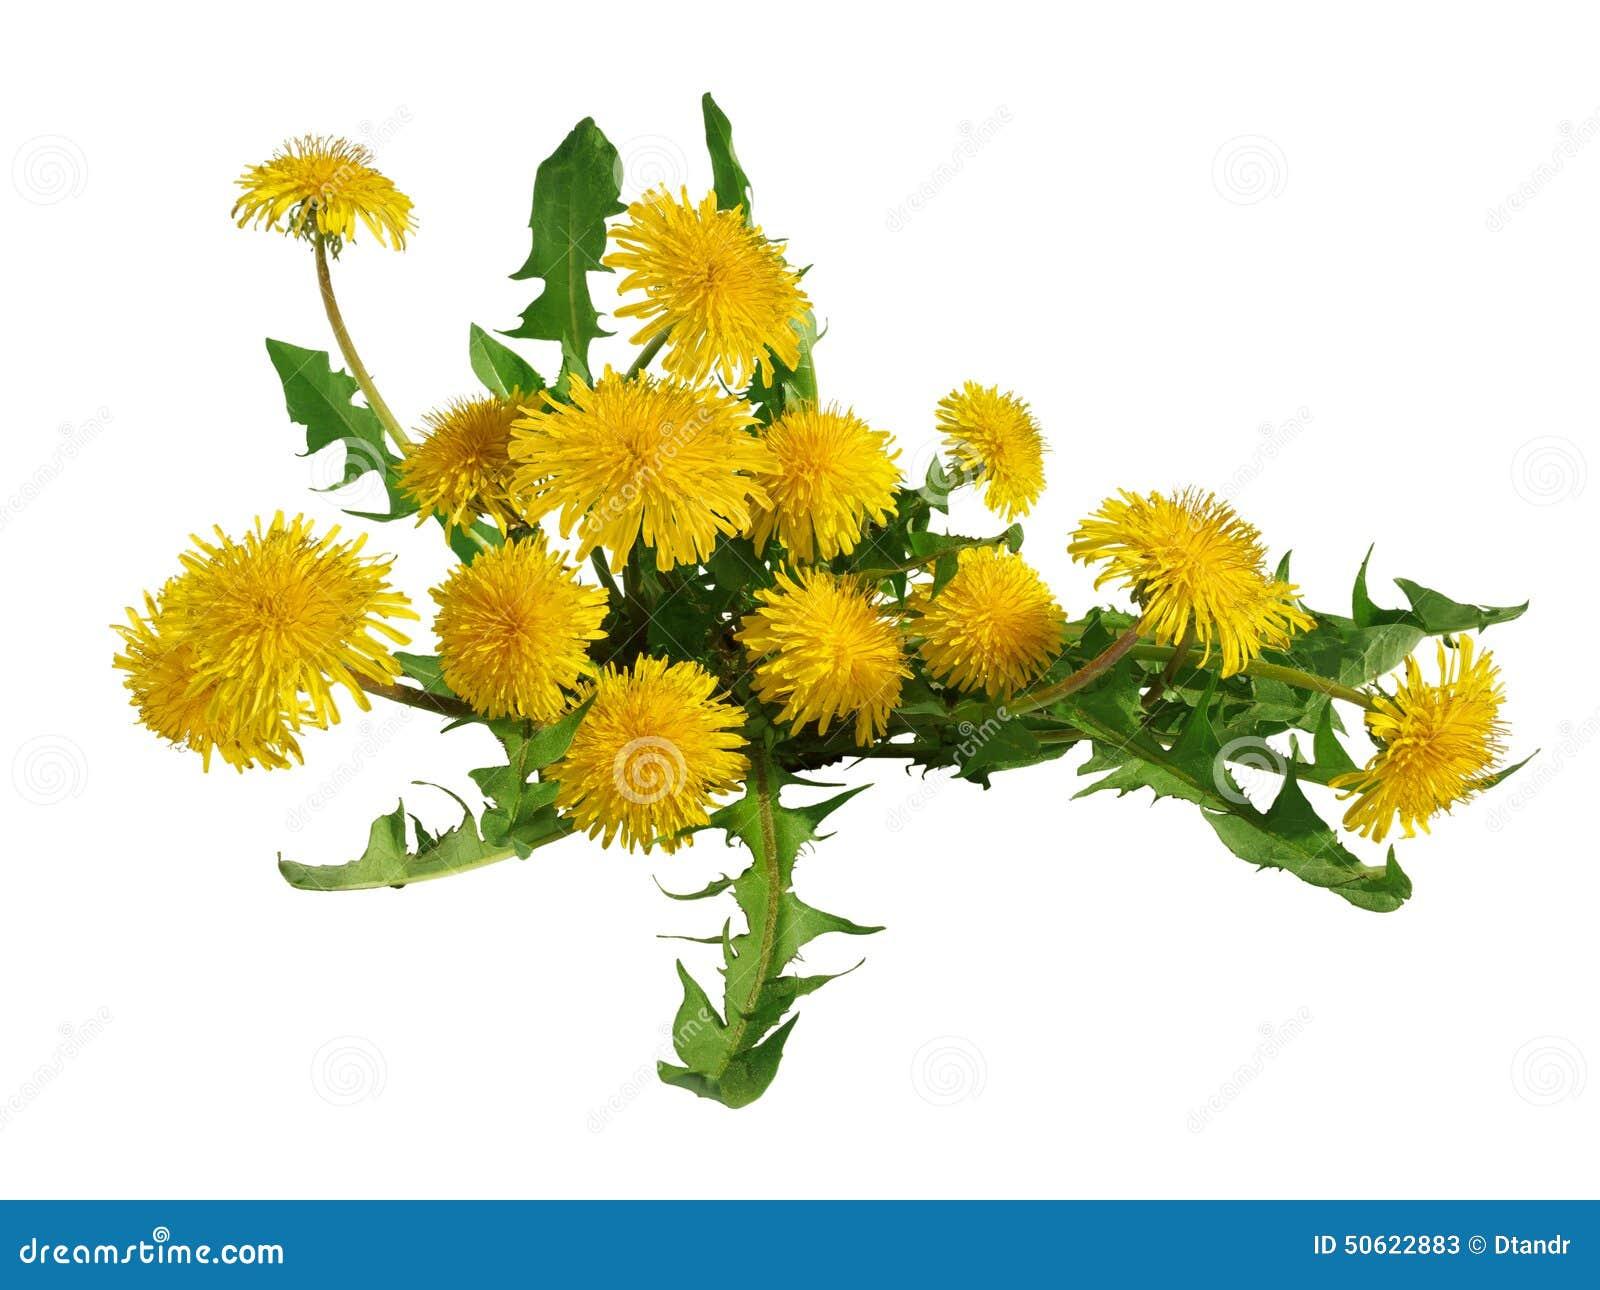 Dandelion flowers bush isolated.